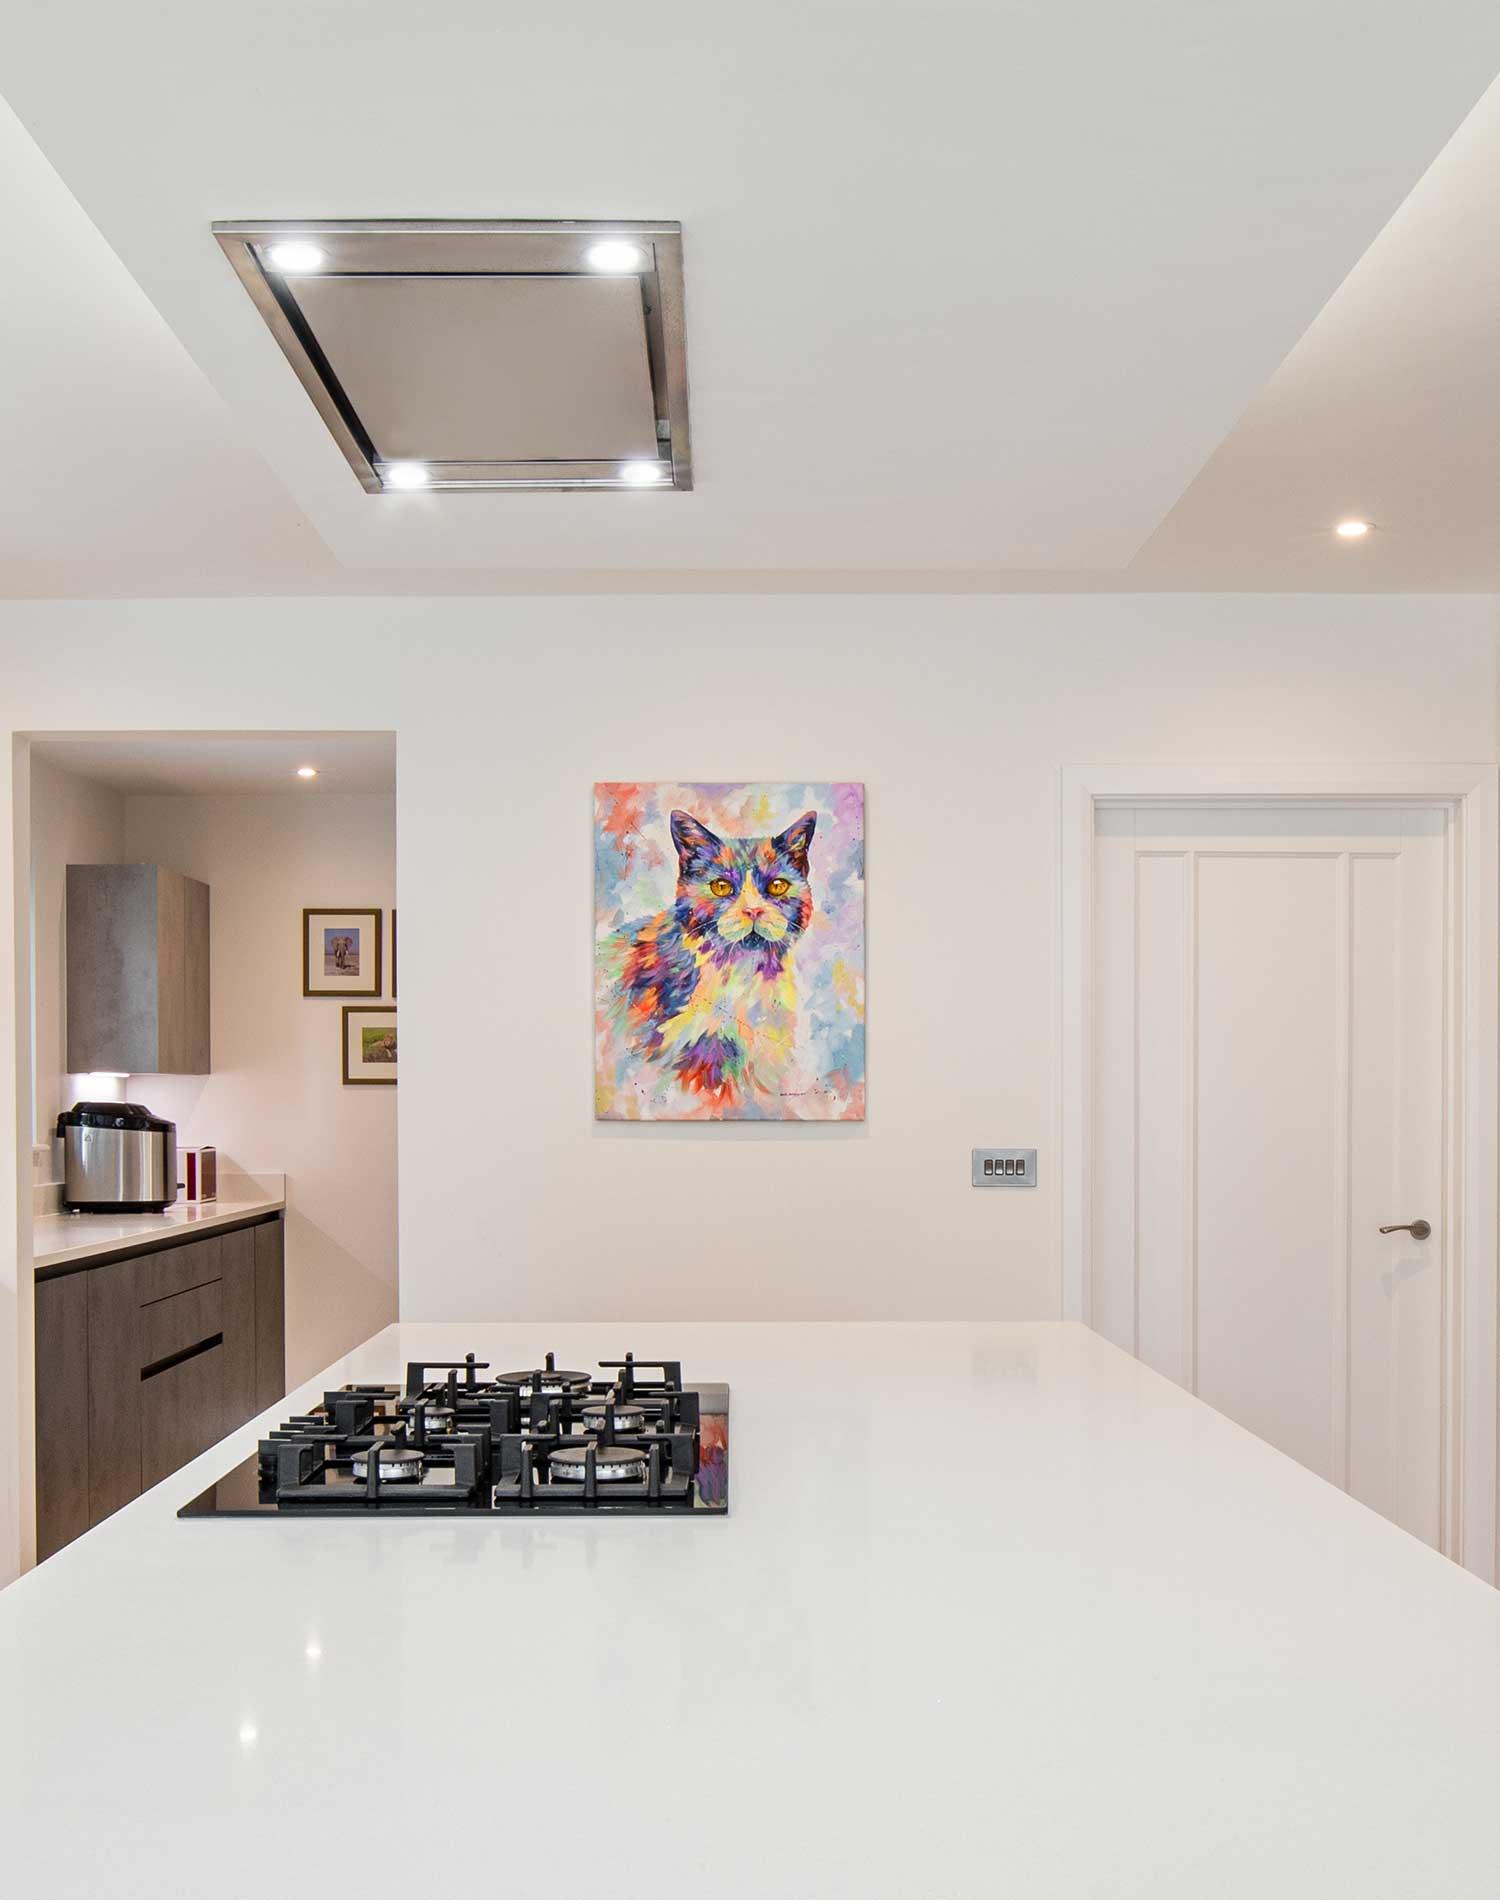 Handleless, sleek kitchen